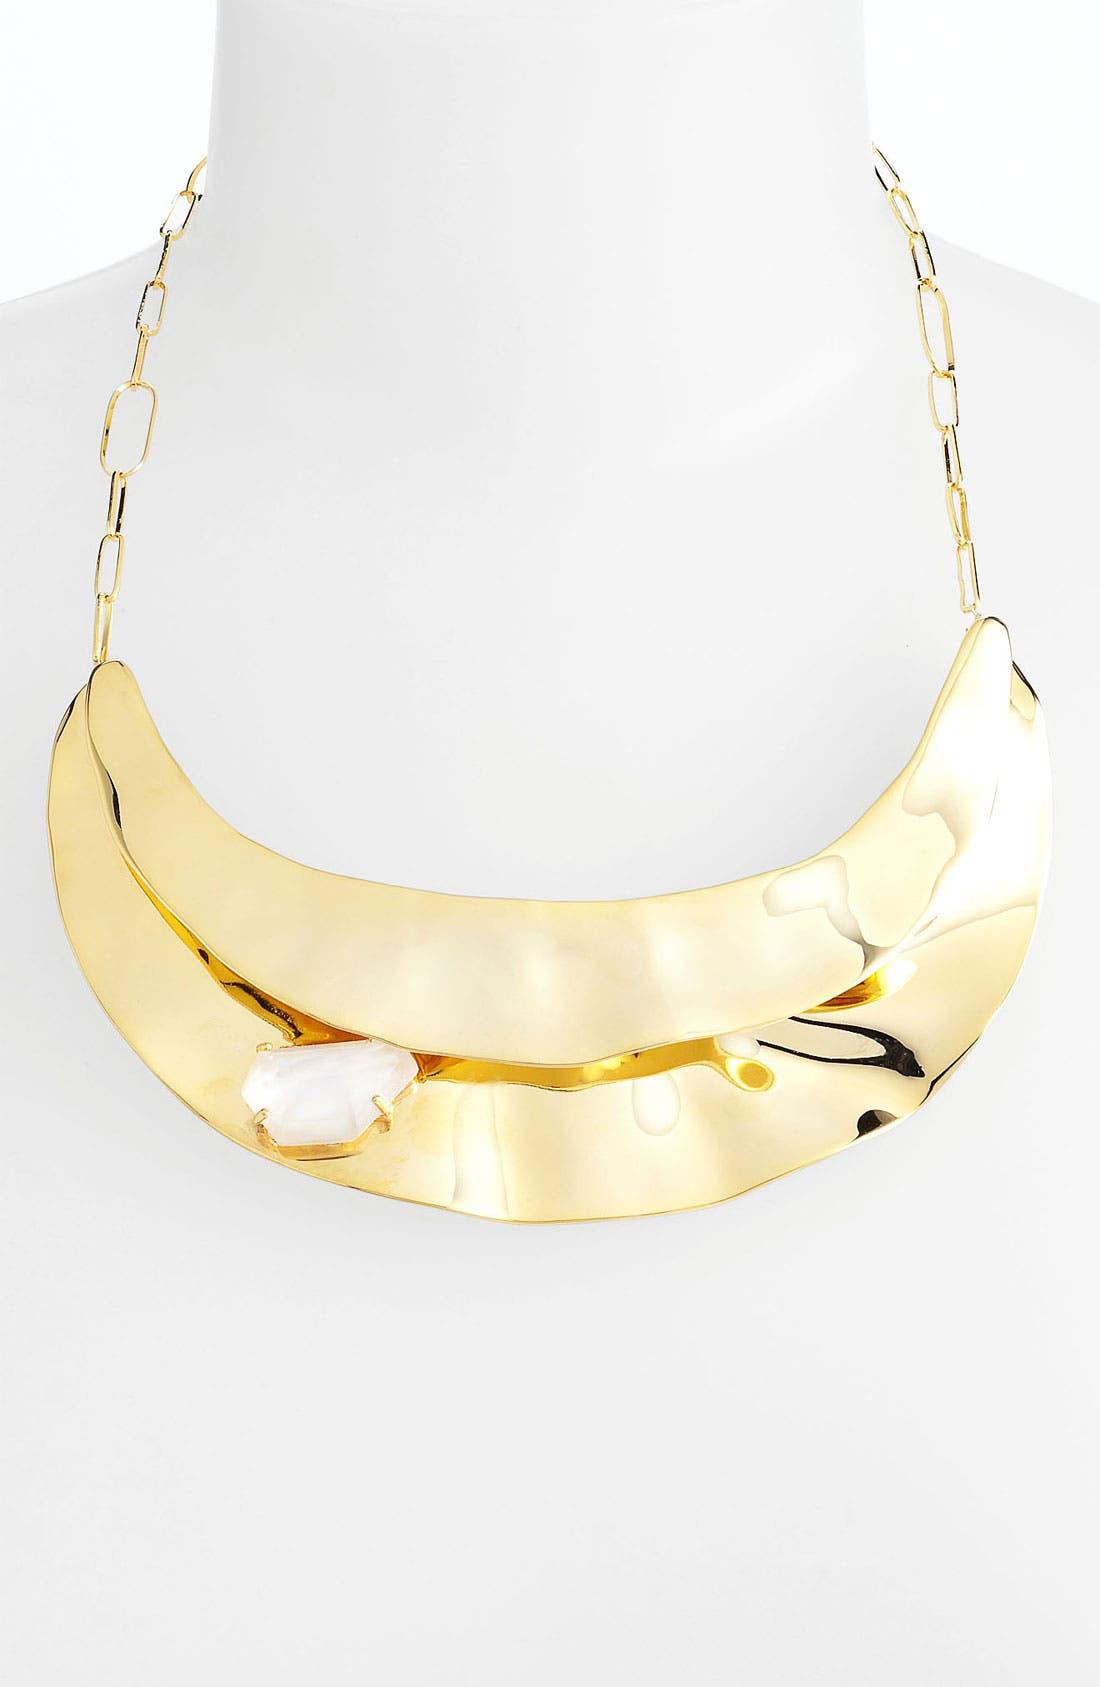 Main Image - Alexis Bittar 'Miss Havisham - Bel Air' Tiered Frontal Necklace